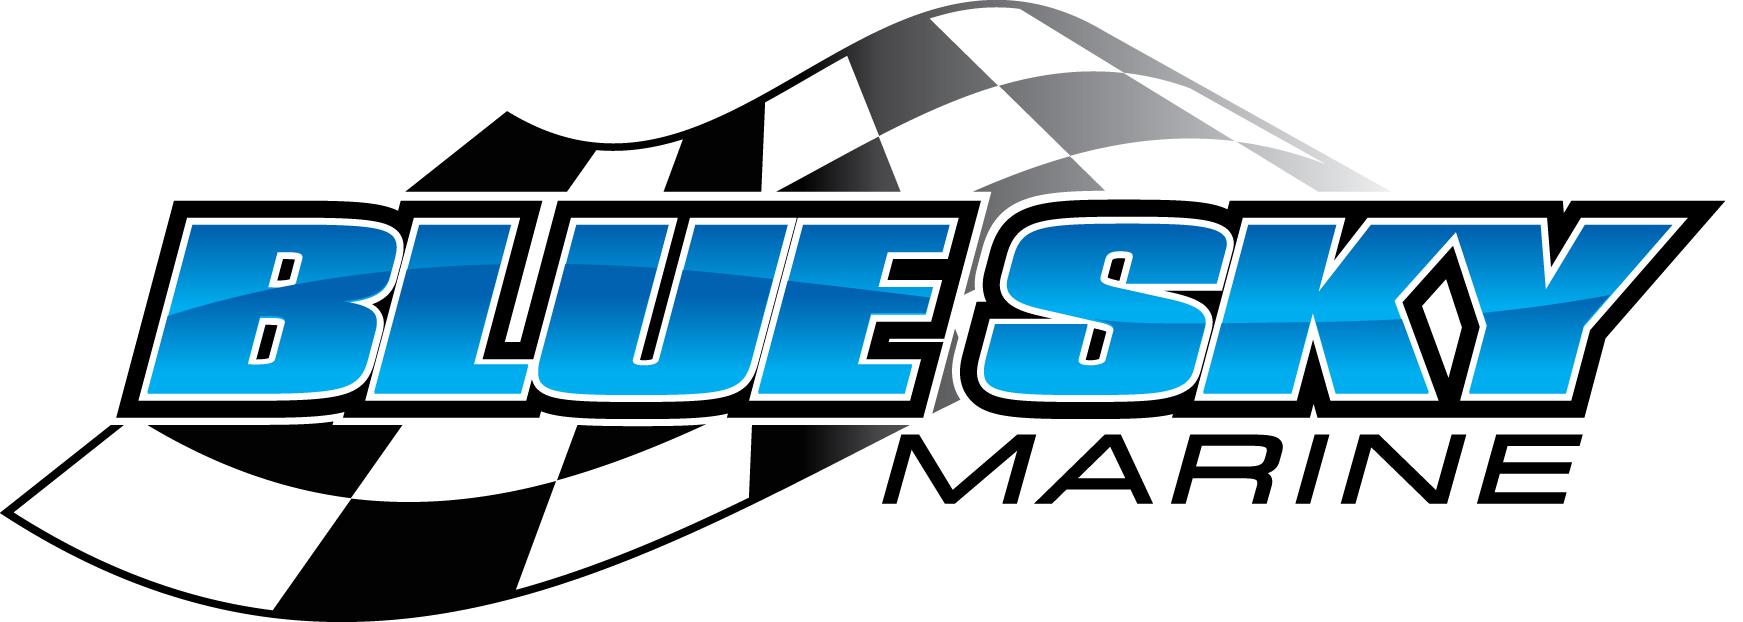 10Blue Sky Marine logo